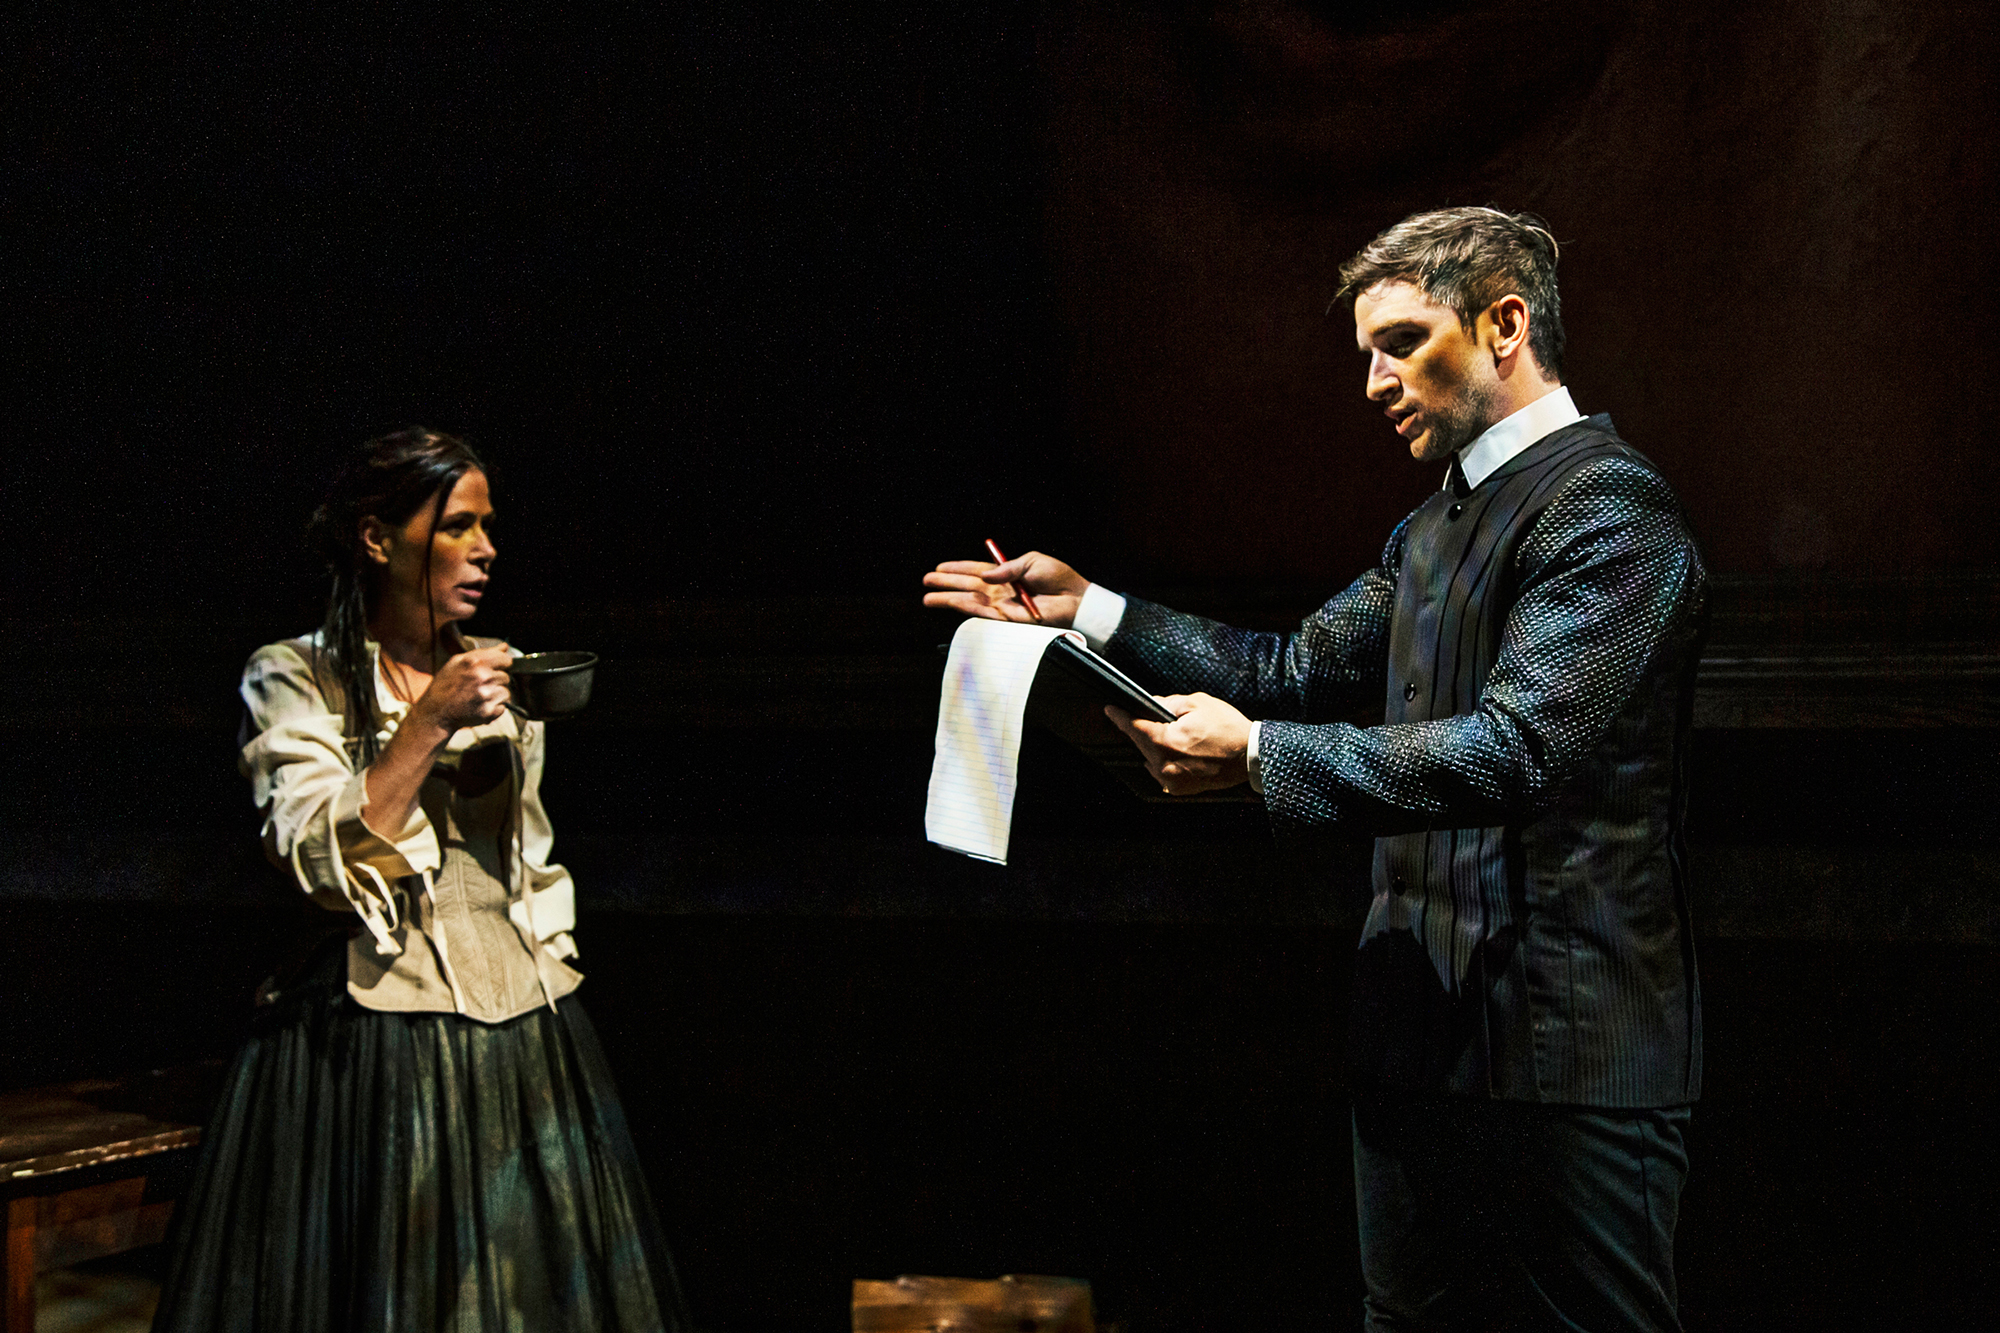 Maura Tierney and Evan Jonigkeit perform in Witch, written by University of Iowa alumna Jen Silverman